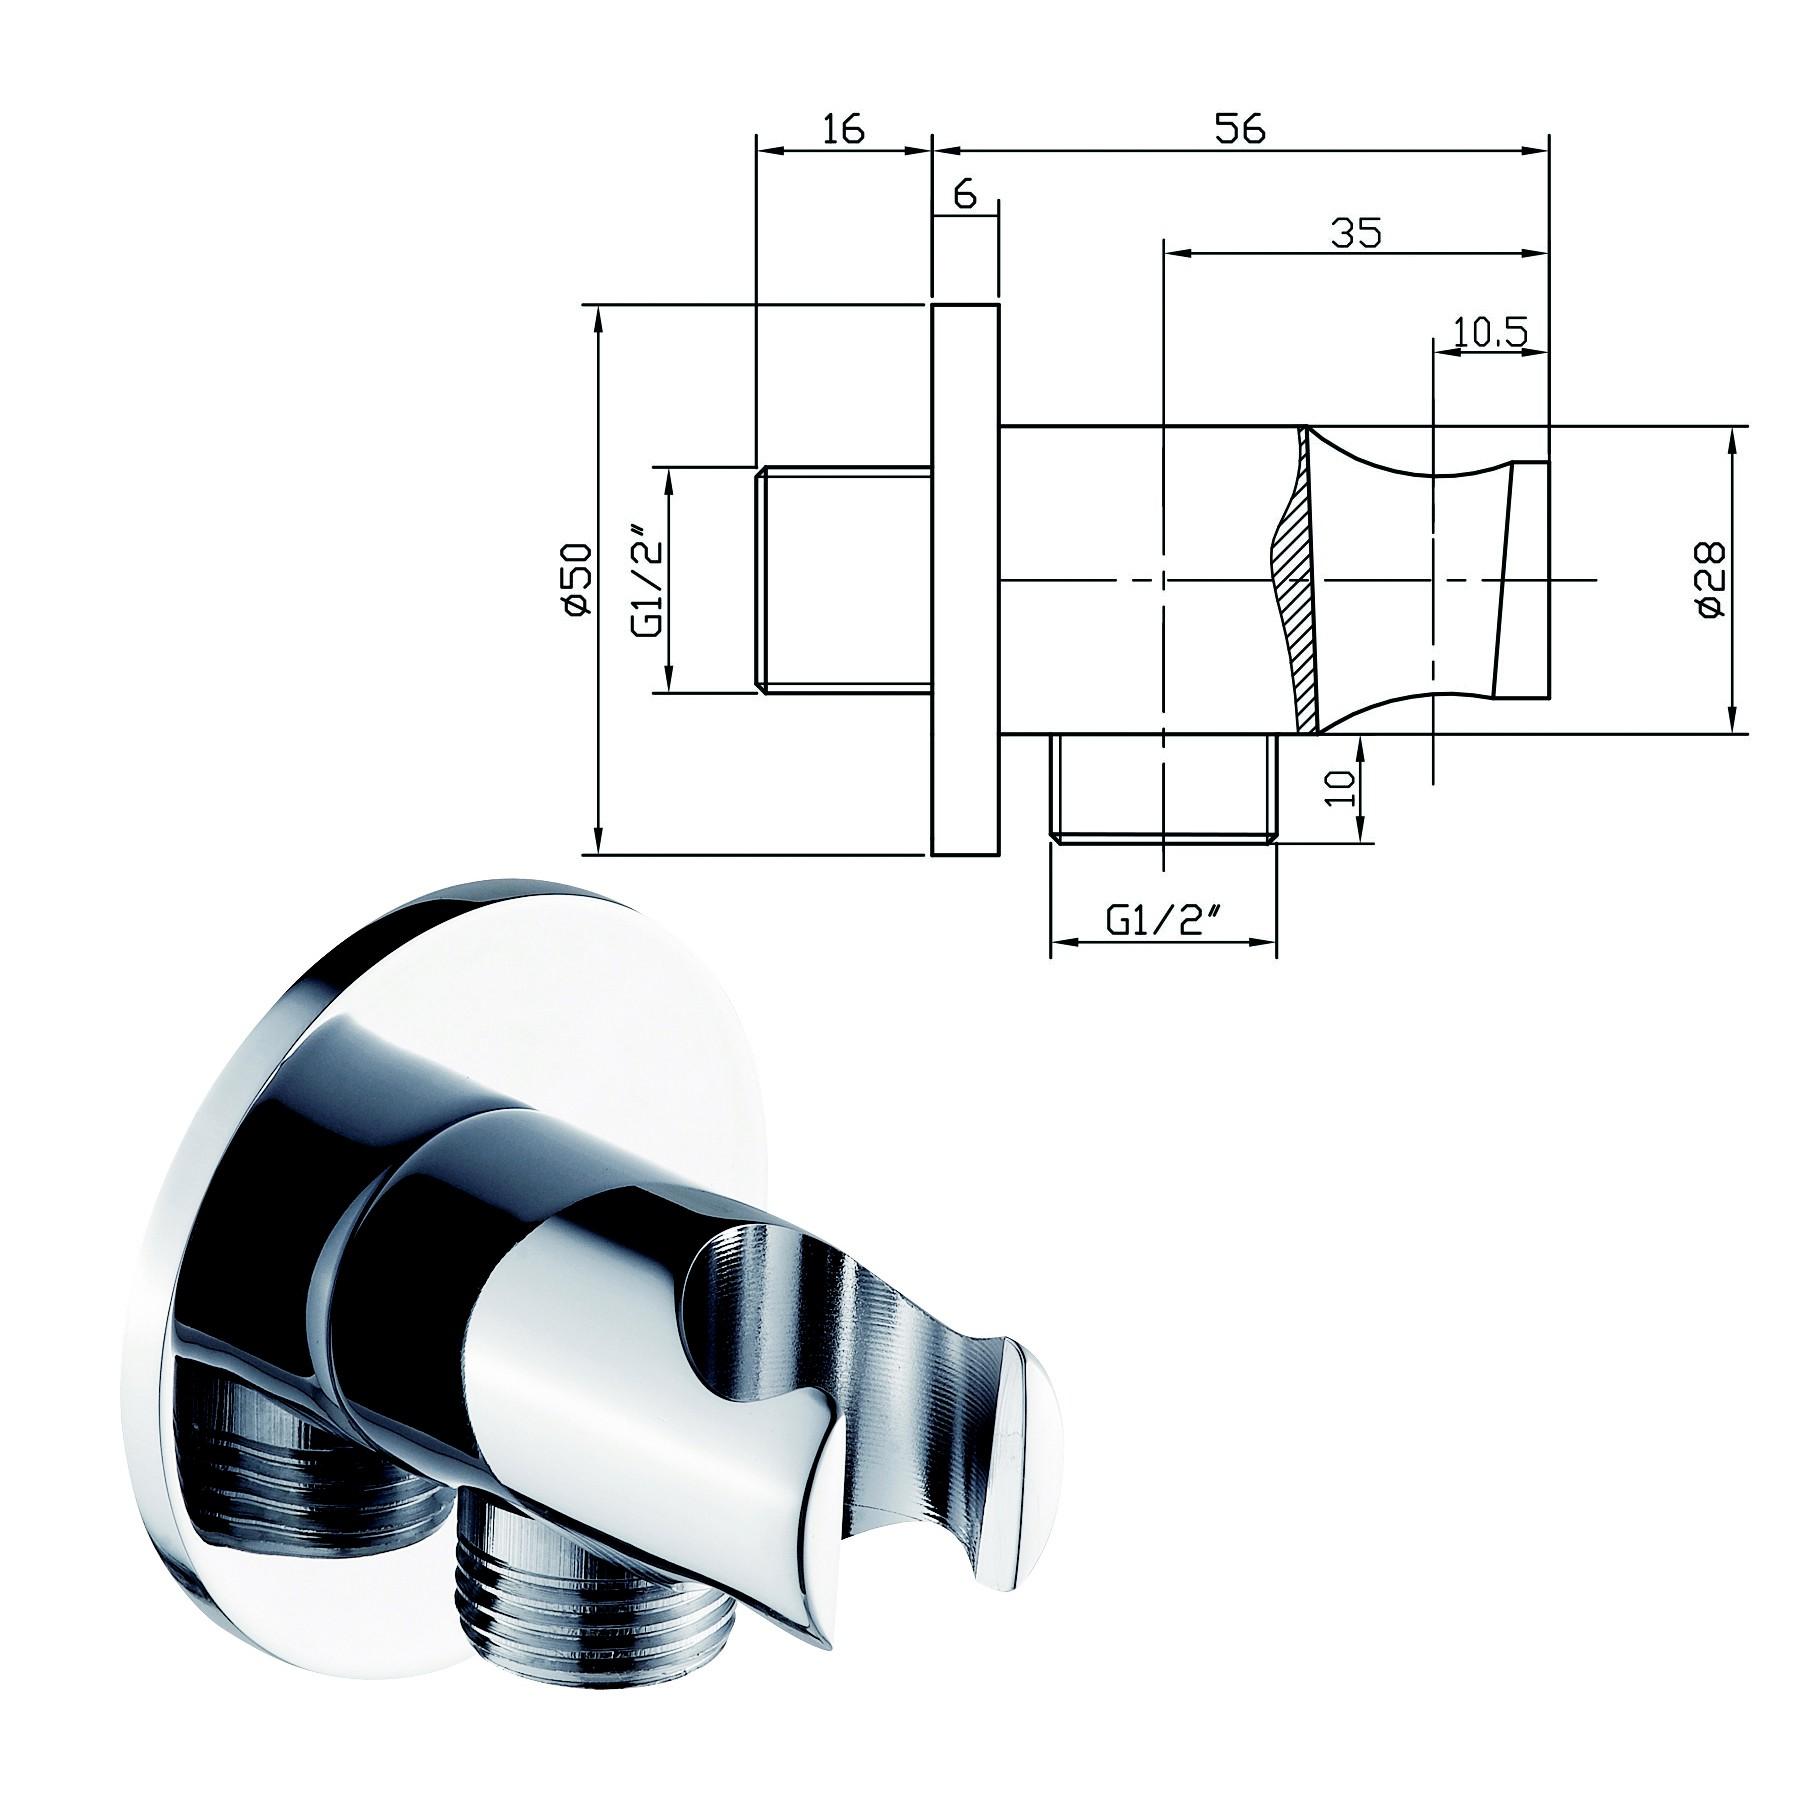 Hochwertige Duschstange DS61 - Duschschlauch / Handbrause / Wandanschlussbogen optional zoom thumbnail 3